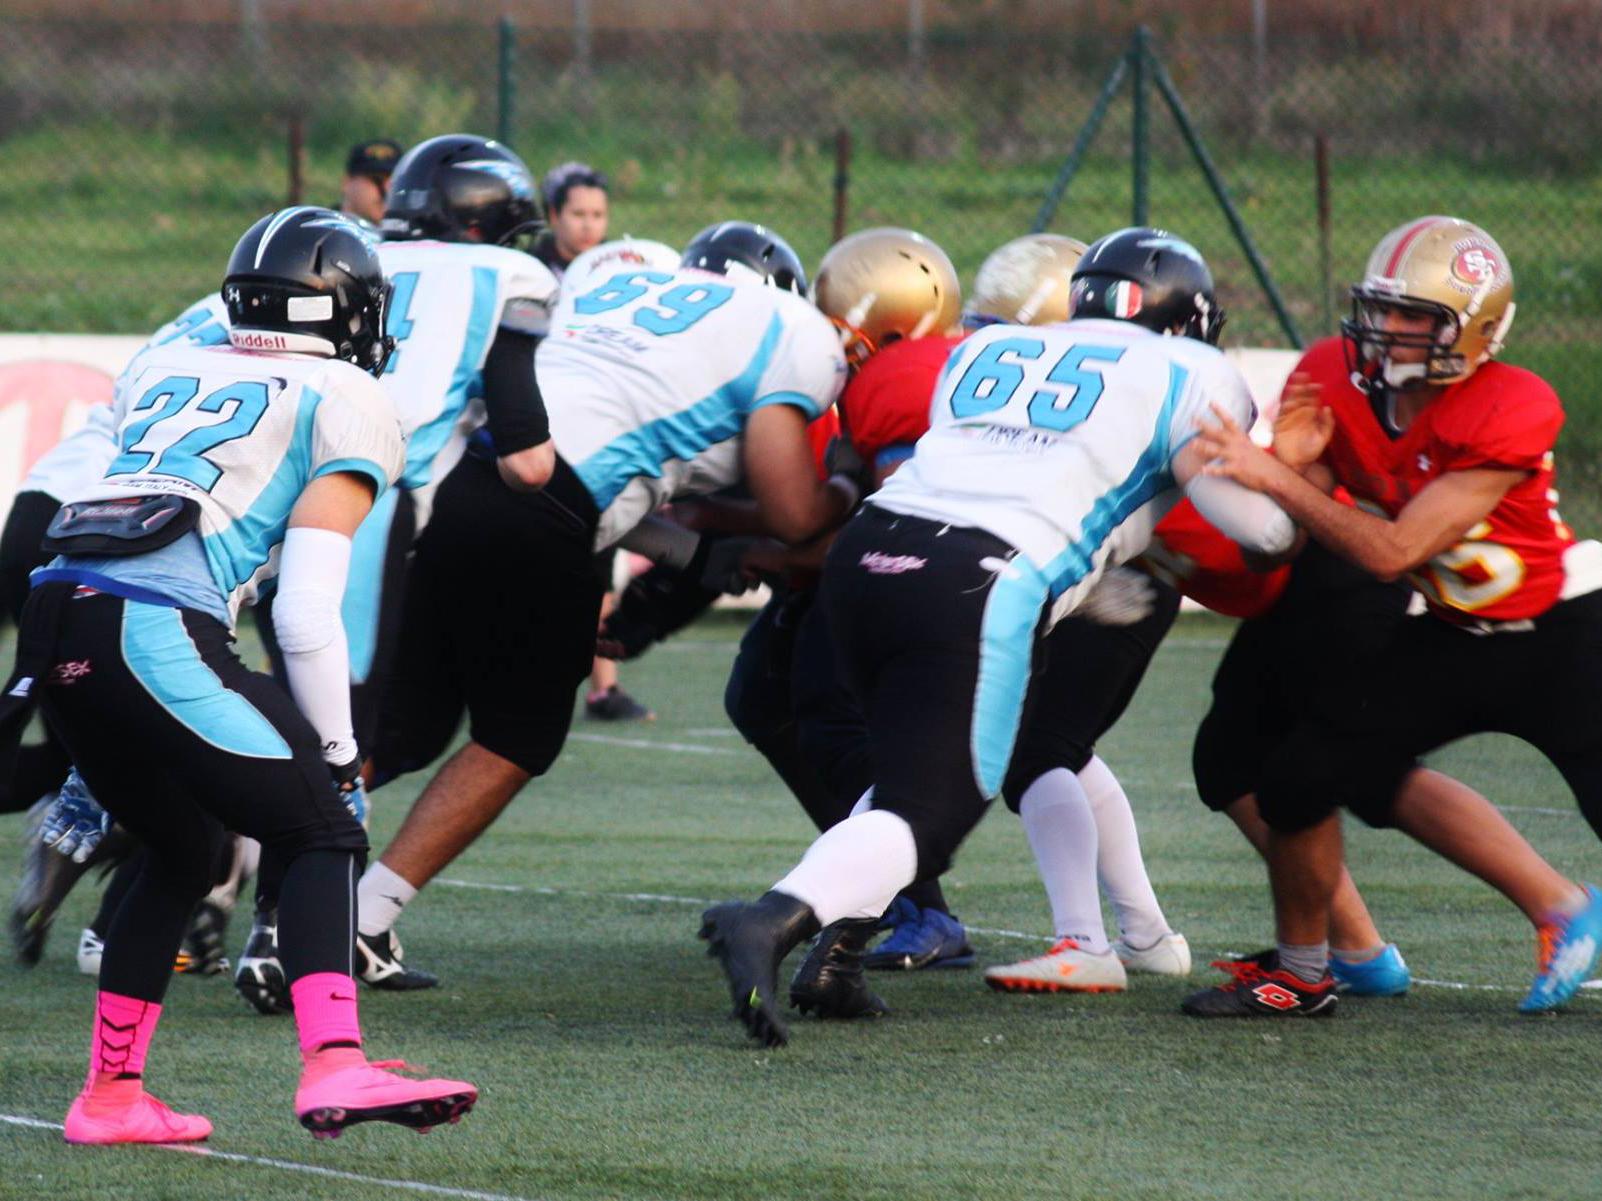 marines-u19-roma-scuola-football-2